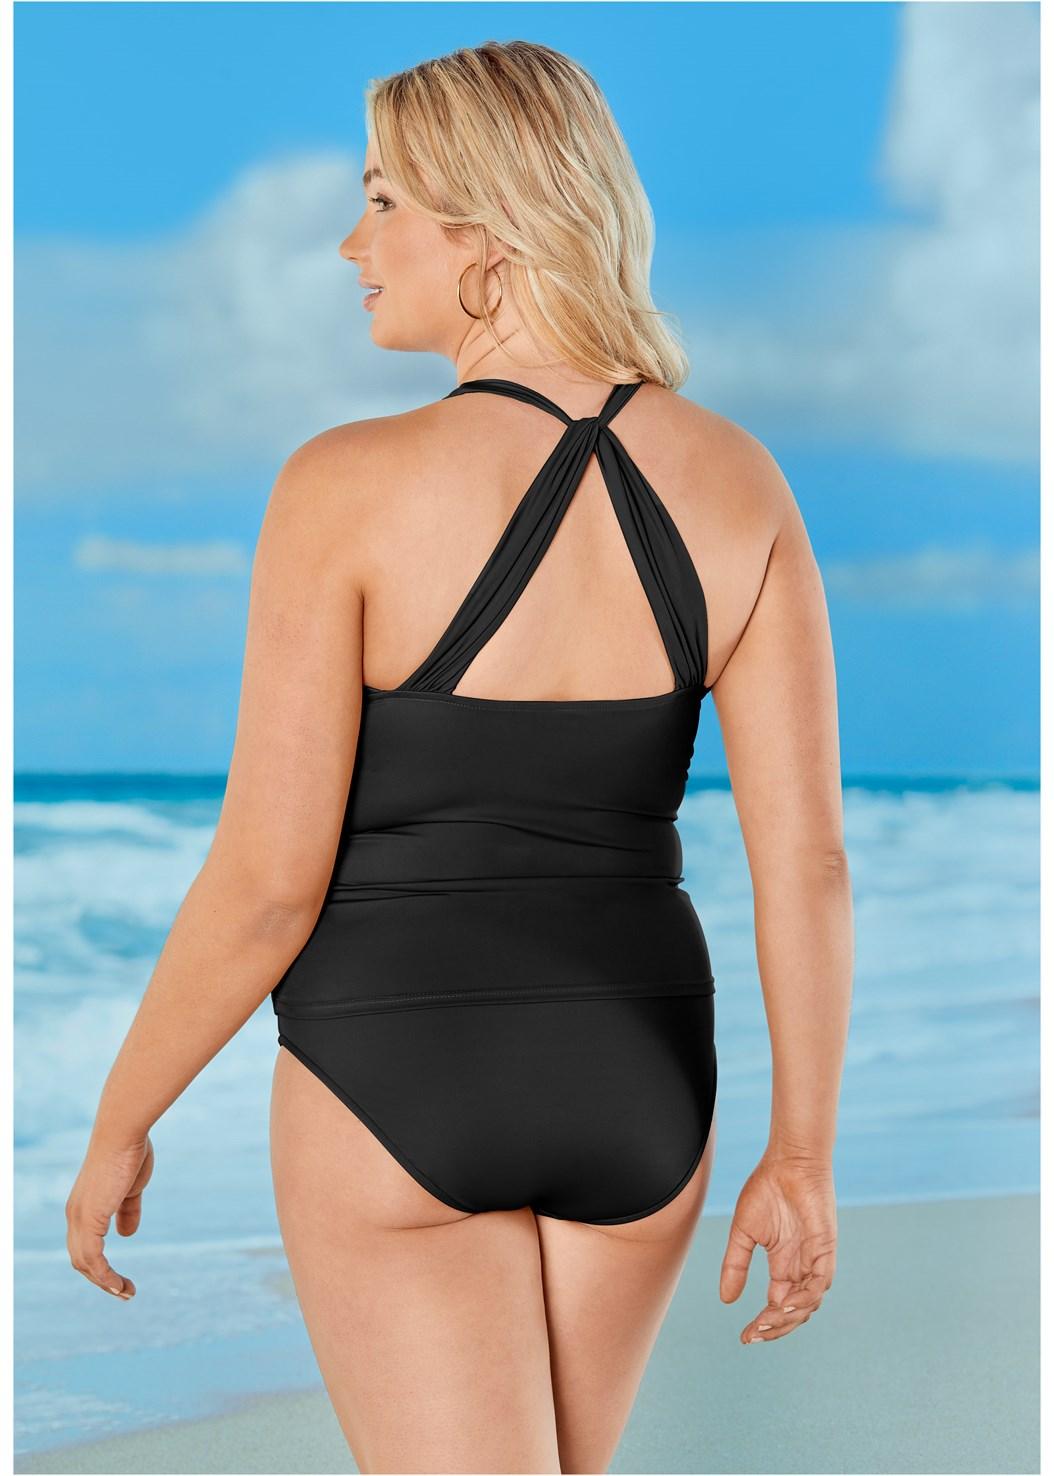 Smoothing V-Back Tankini,Full Coverage Mid Rise Hipster Bikini Bottom,Leila High Waist Bottom,Skirted Swim Bikini Bottom,Gathered Neckline Dress